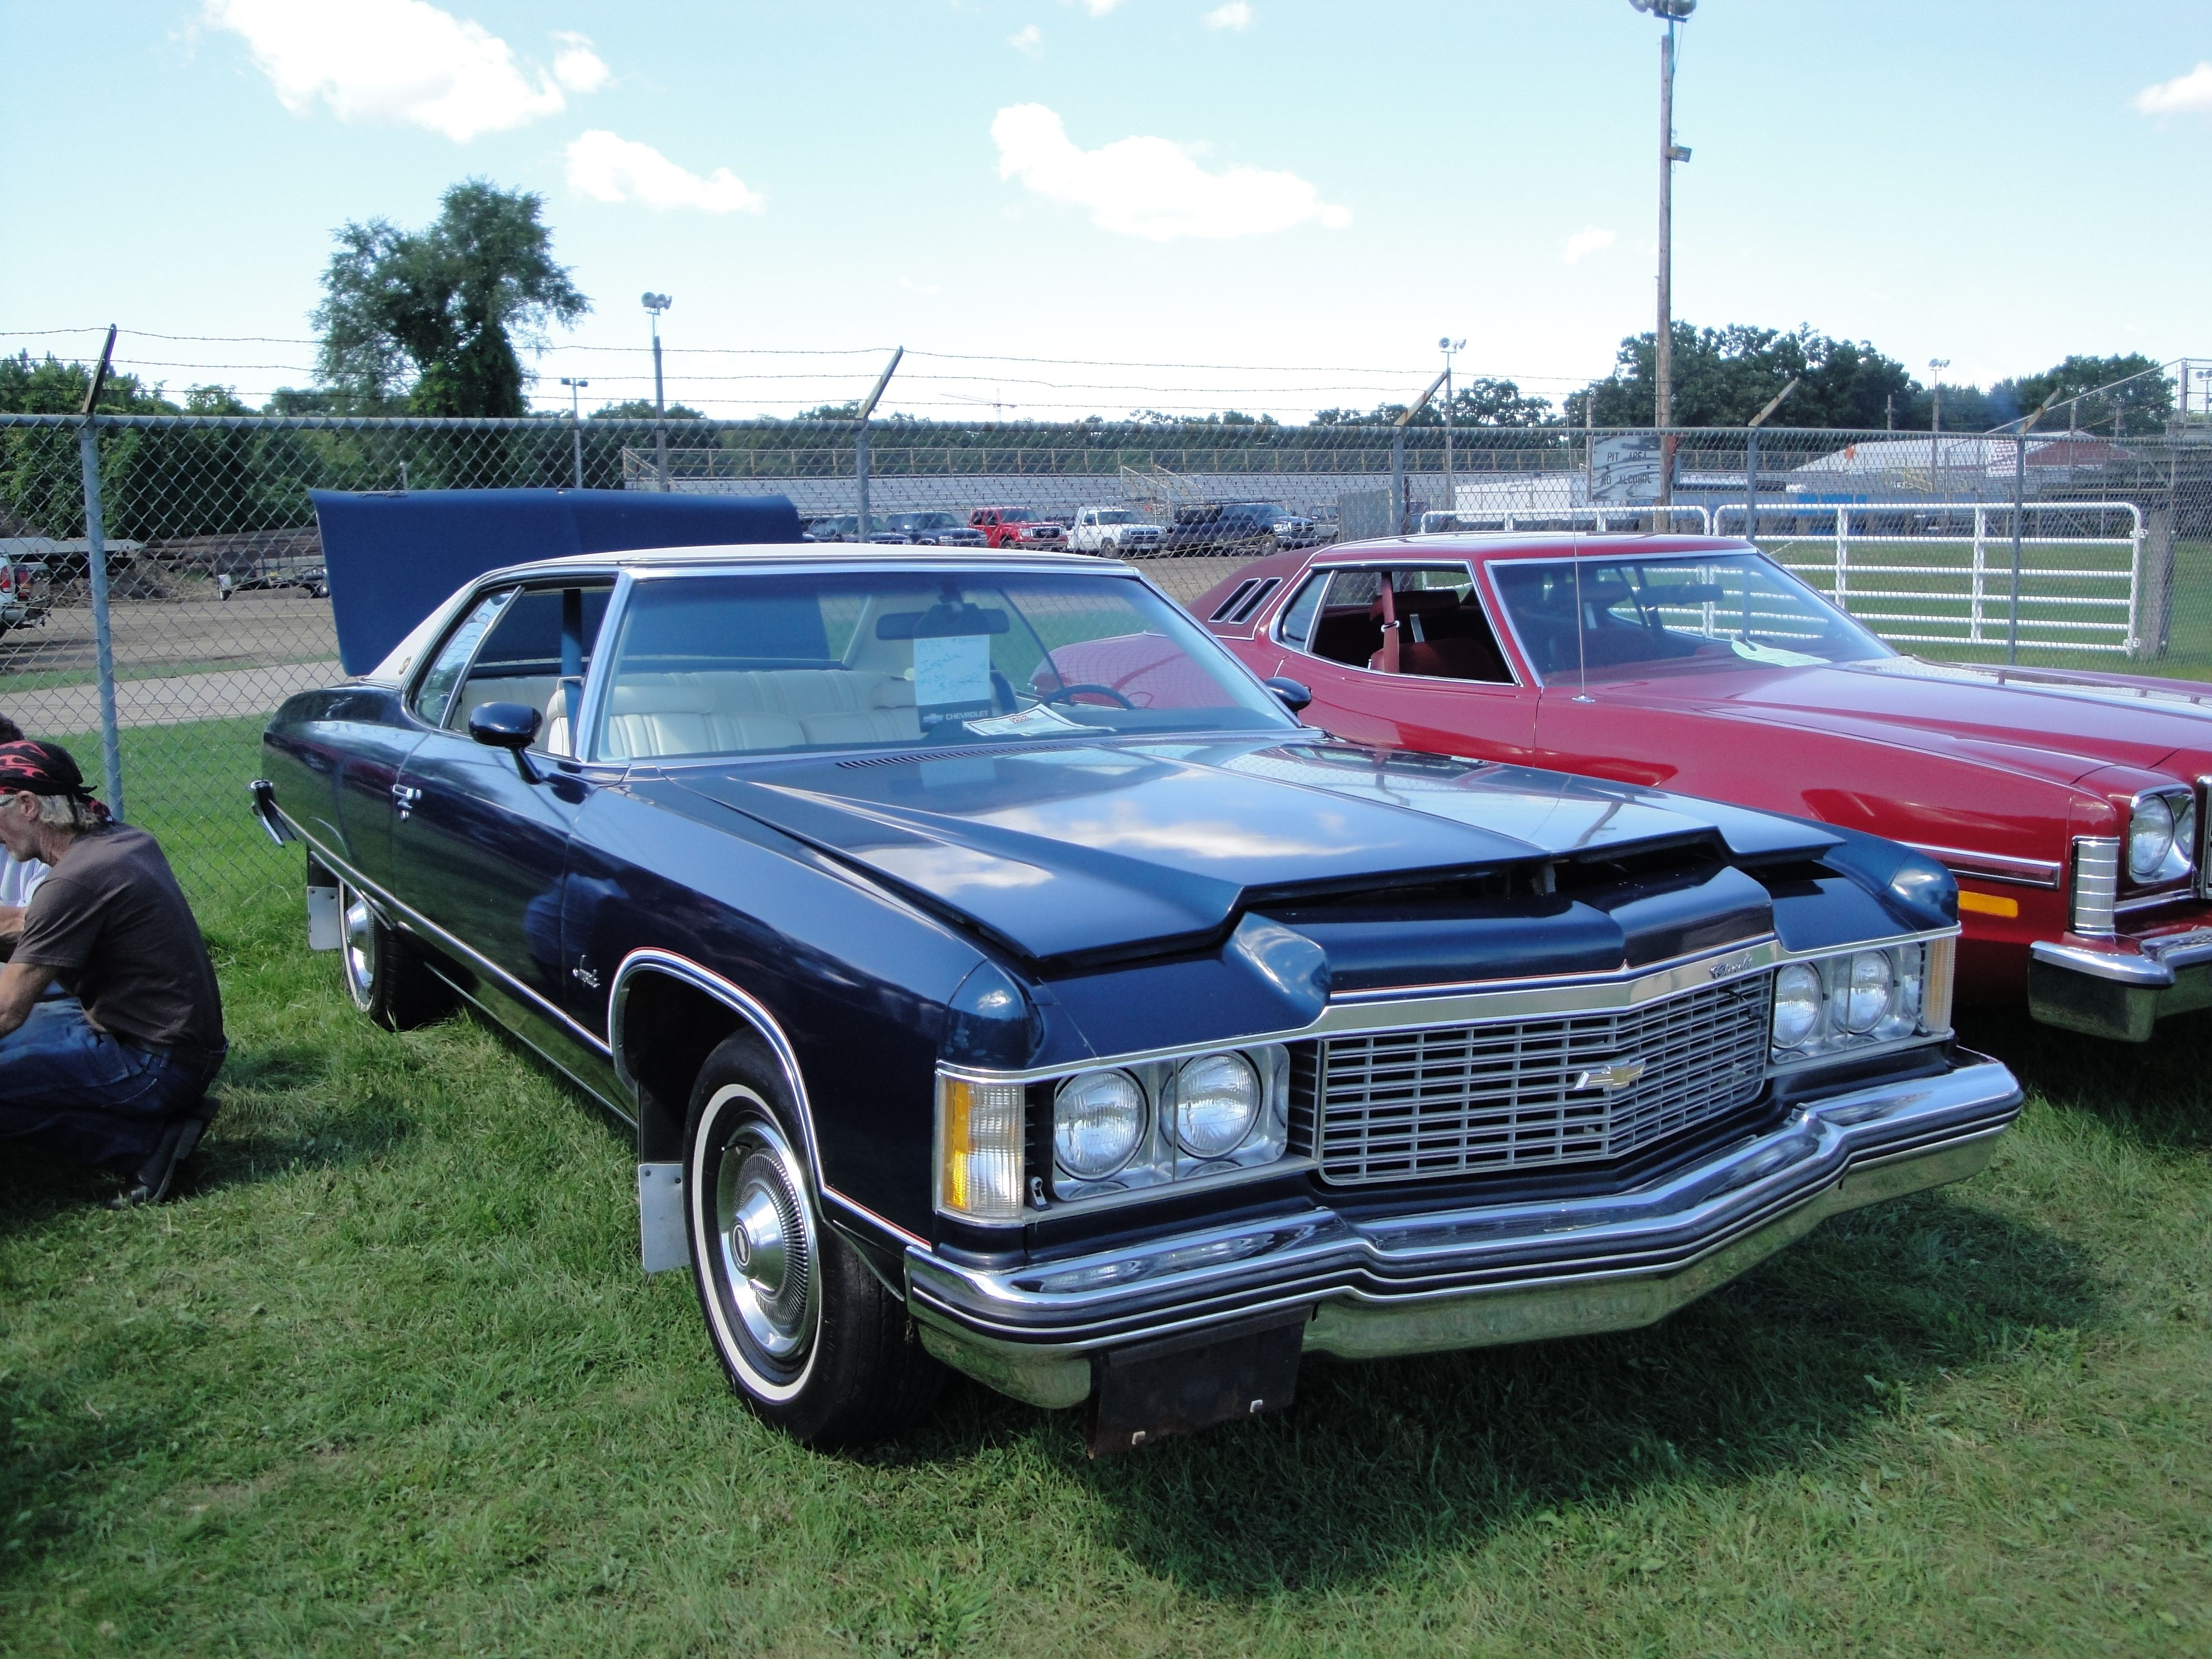 small resolution of 1974 chevrolet impala spirit of america edition